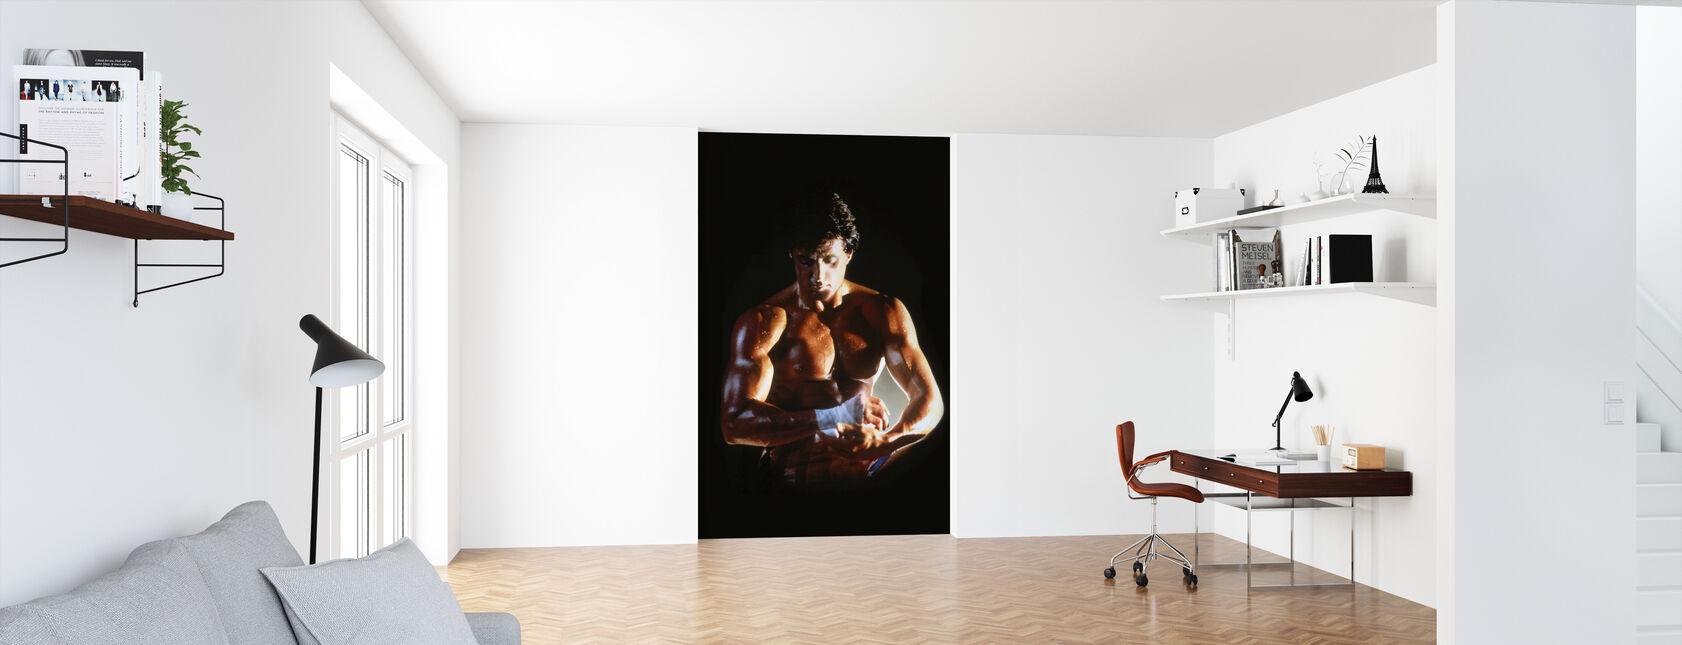 Sylvester Stallone in Rocky IV - Tapete - Büro